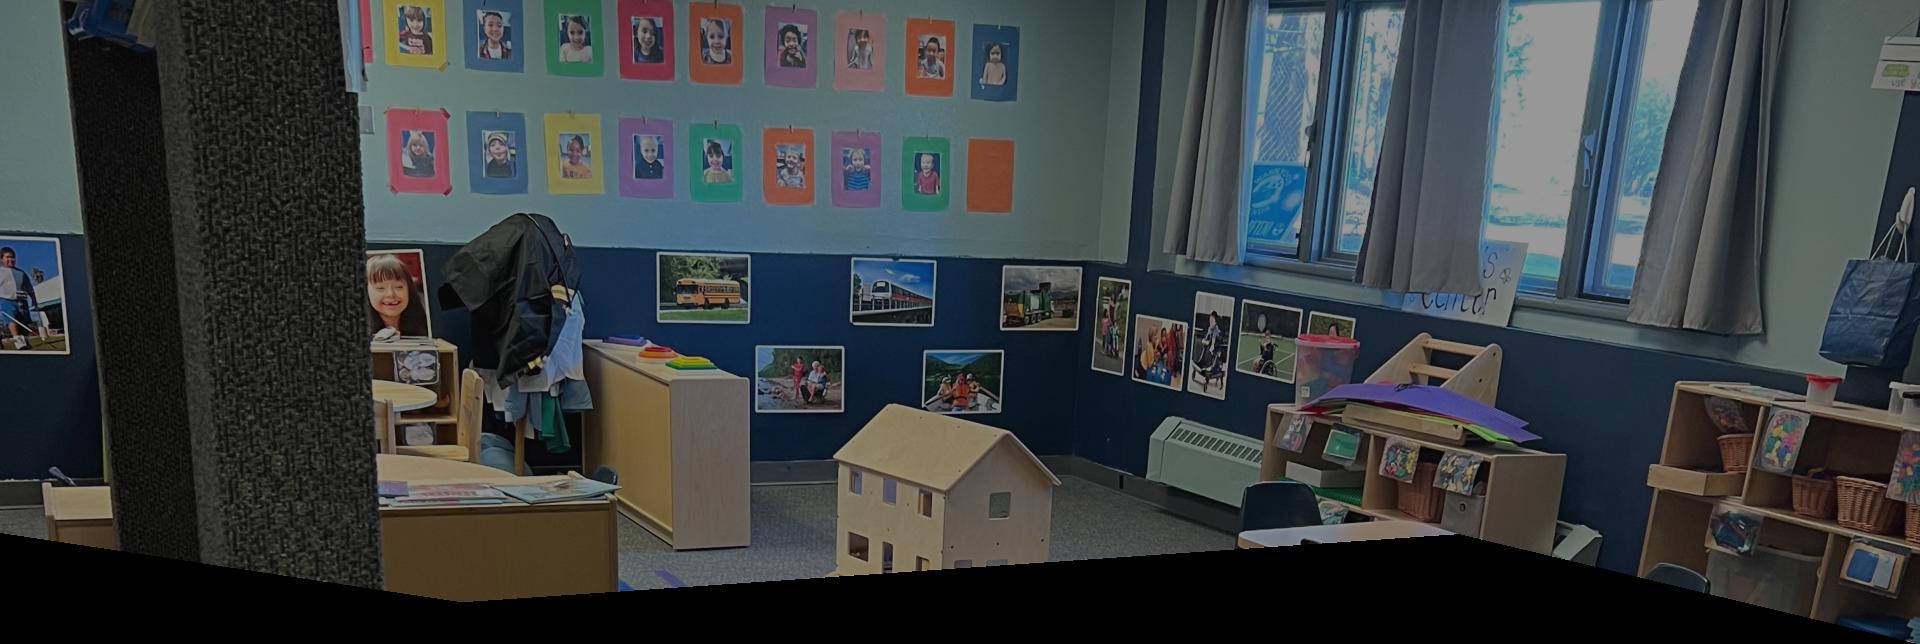 kids forming circles